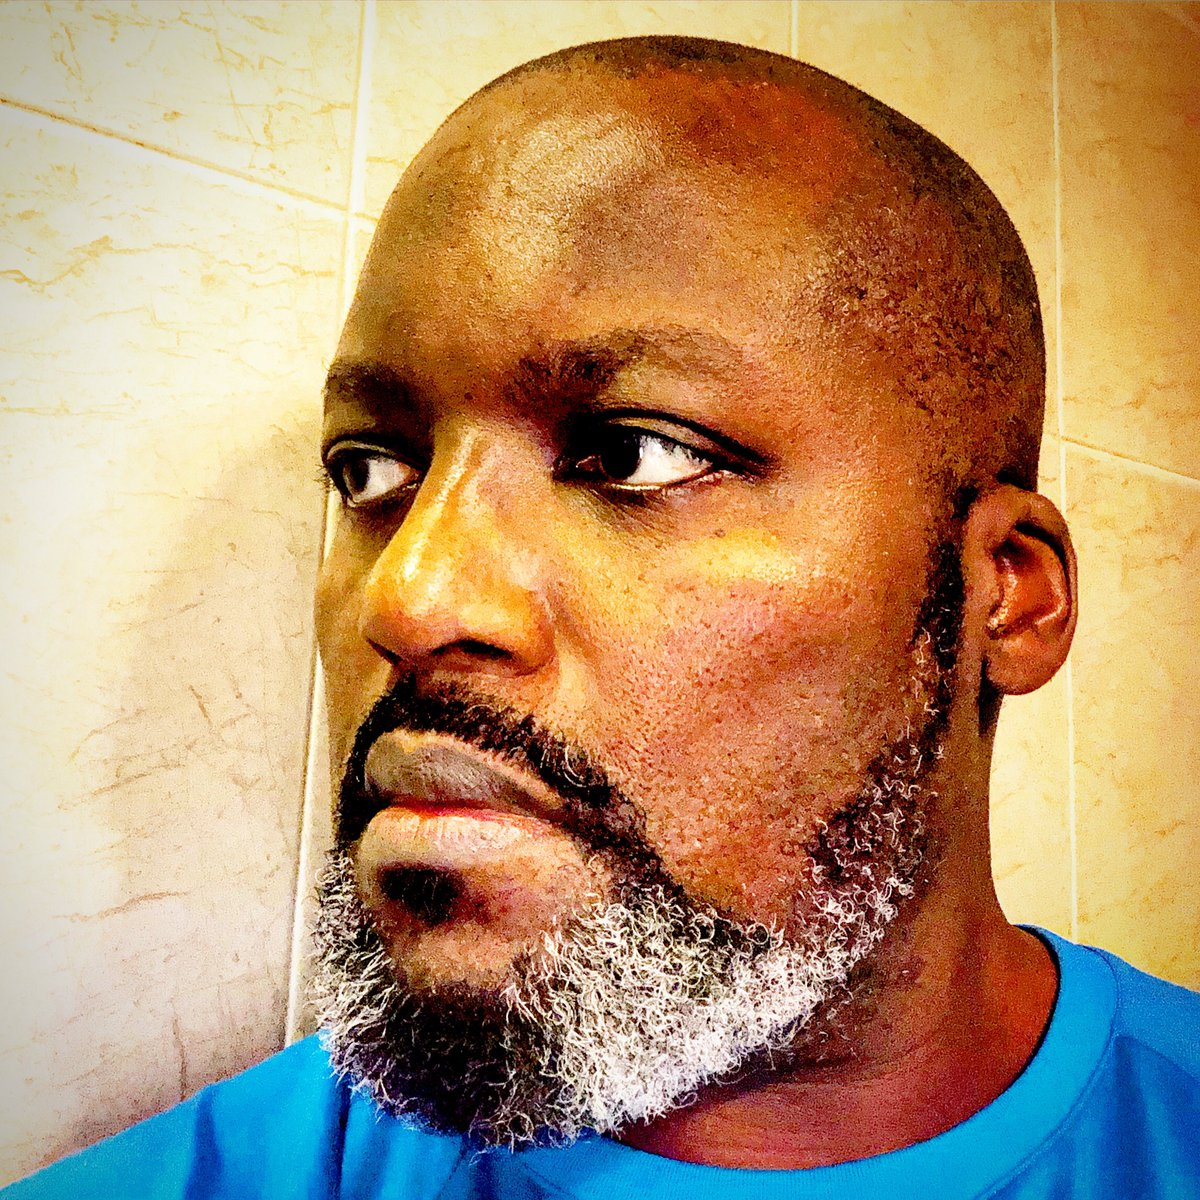 Getting the hang of doing it myself for the second time during the lockdown #homebarber #barber #haircut #beardtrim #shave #nairobi #kenya #africa #quarantine #lockdown #covid19 #coronaviruspic.twitter.com/MHpE3t1H2F